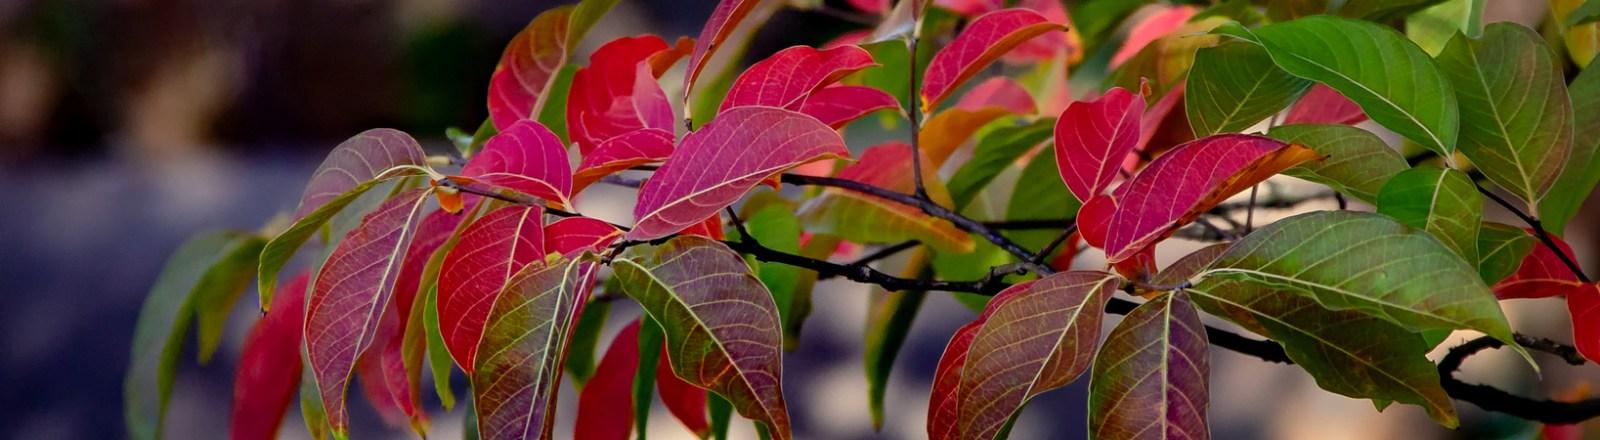 Autumn in Atlanta: Photo Mash-Up #7